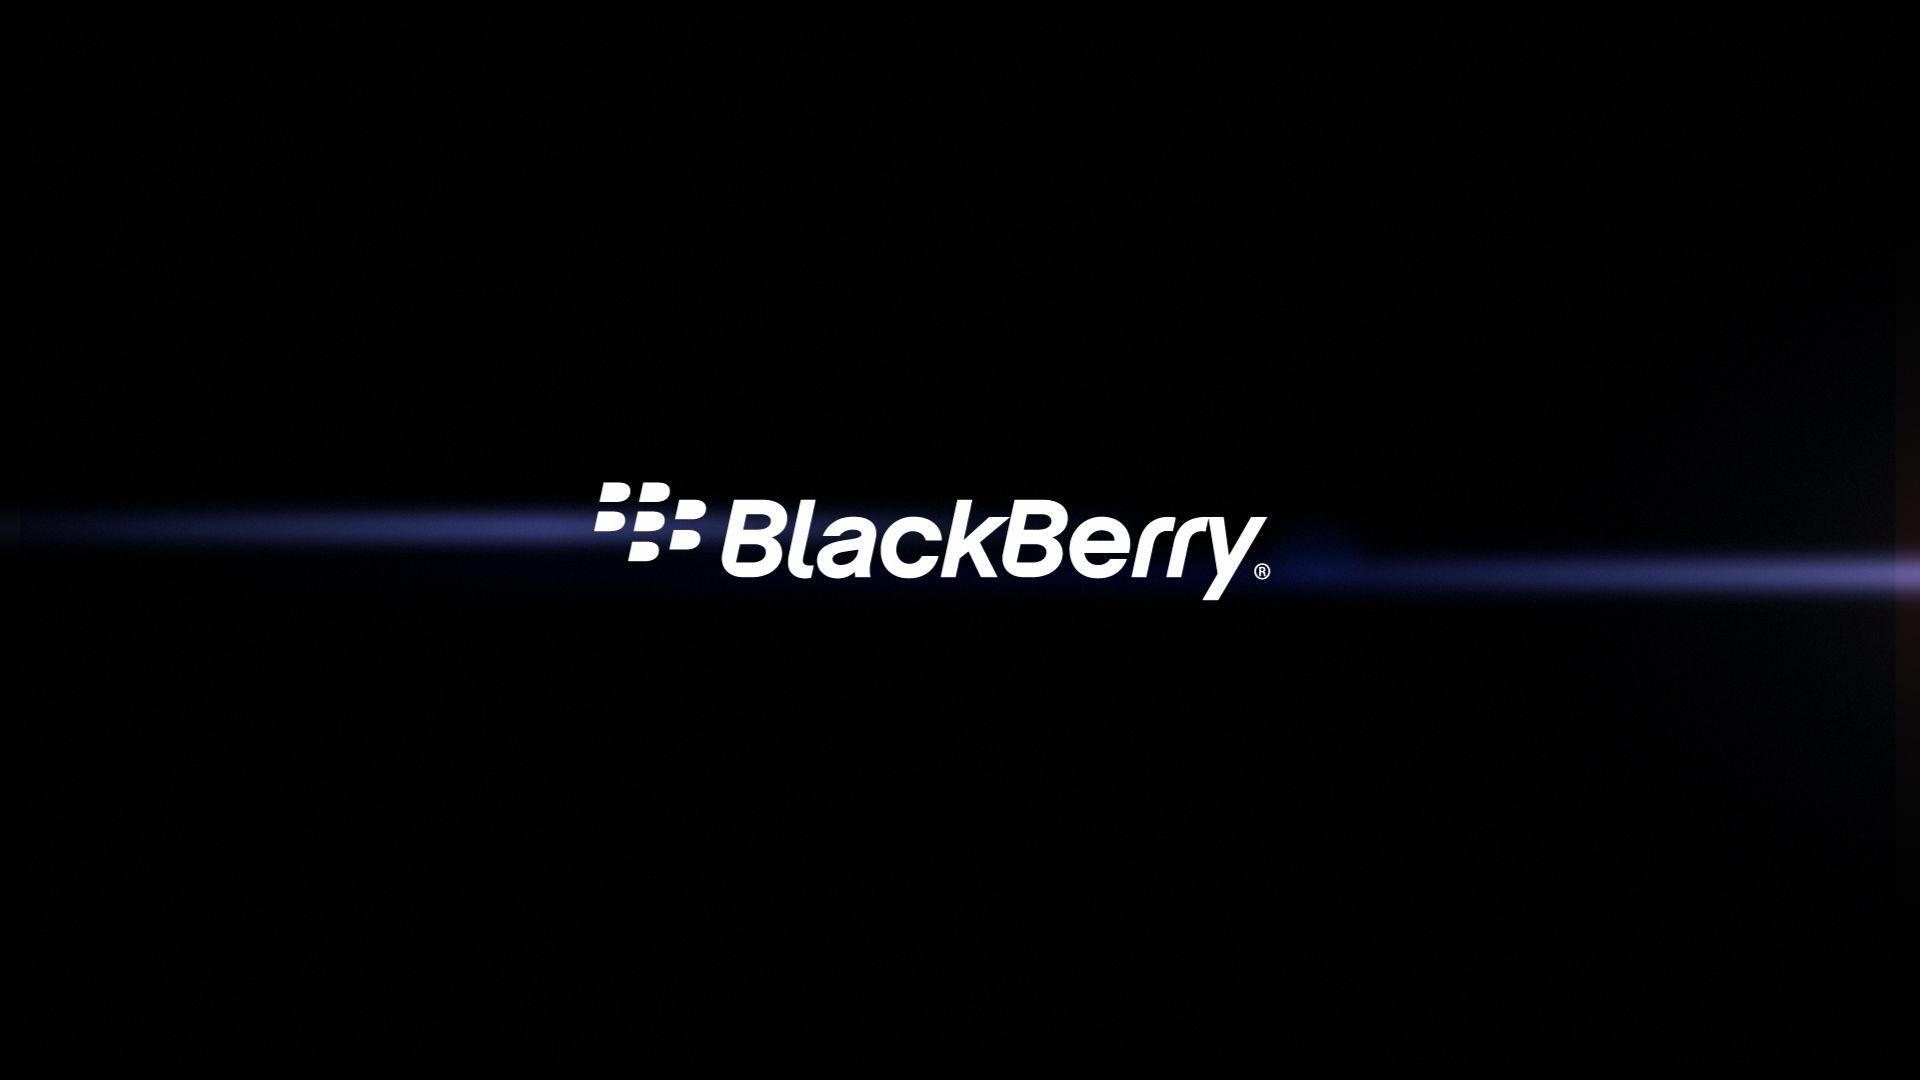 Blackberry Symbol Wallpaper 19201080 Blackberry Symbol Wallpapers